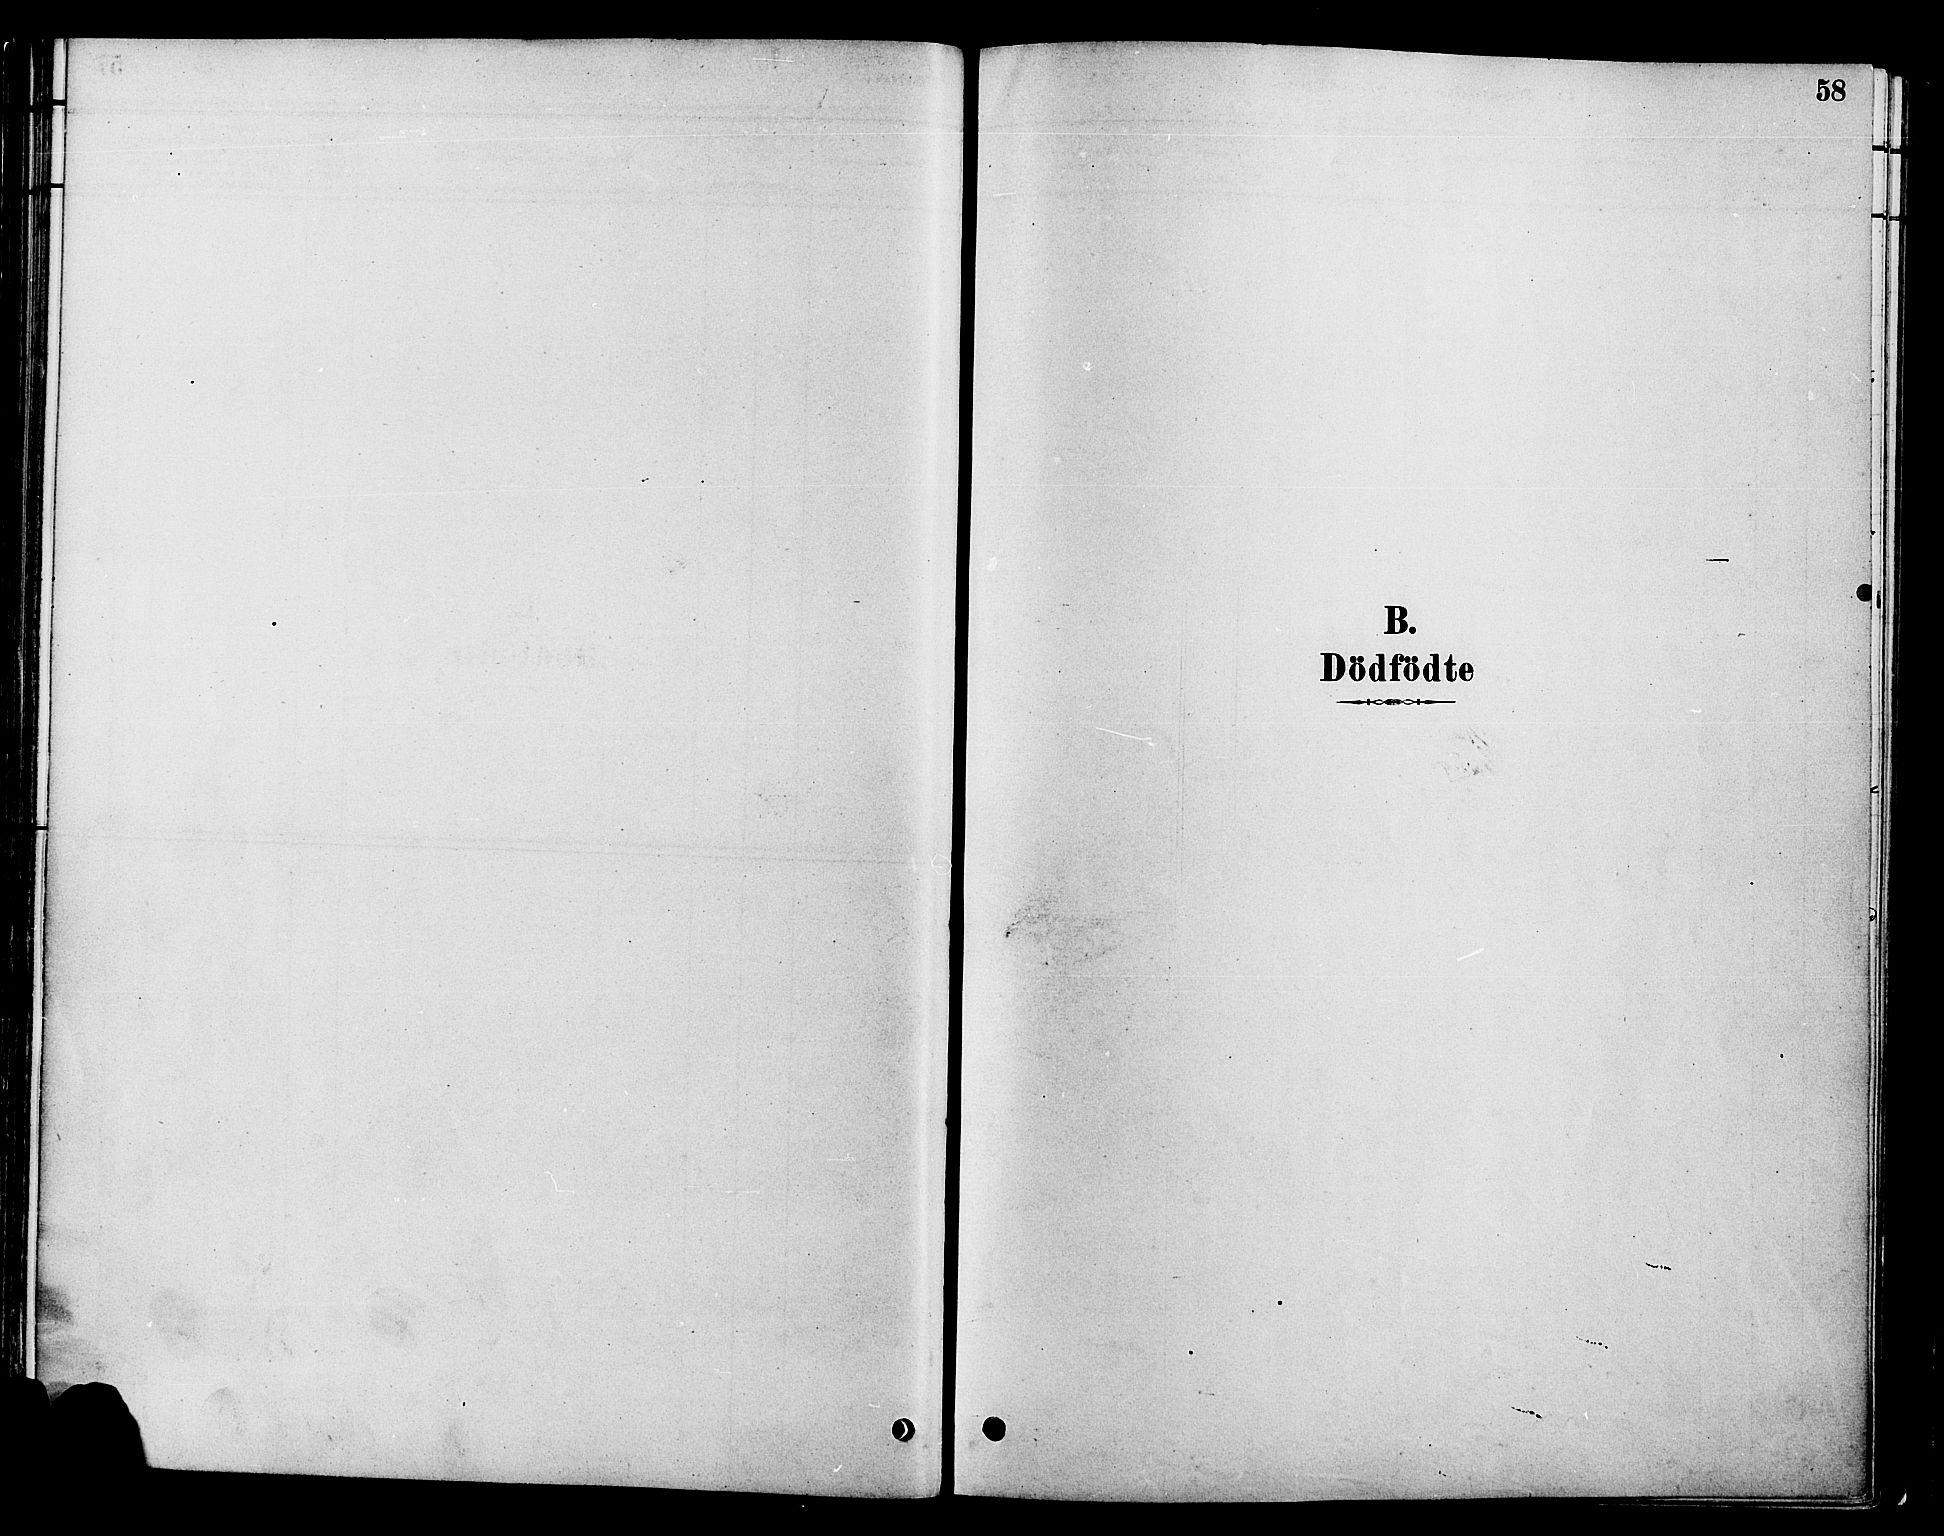 SAH, Gran prestekontor, Ministerialbok nr. 16, 1880-1888, s. 58